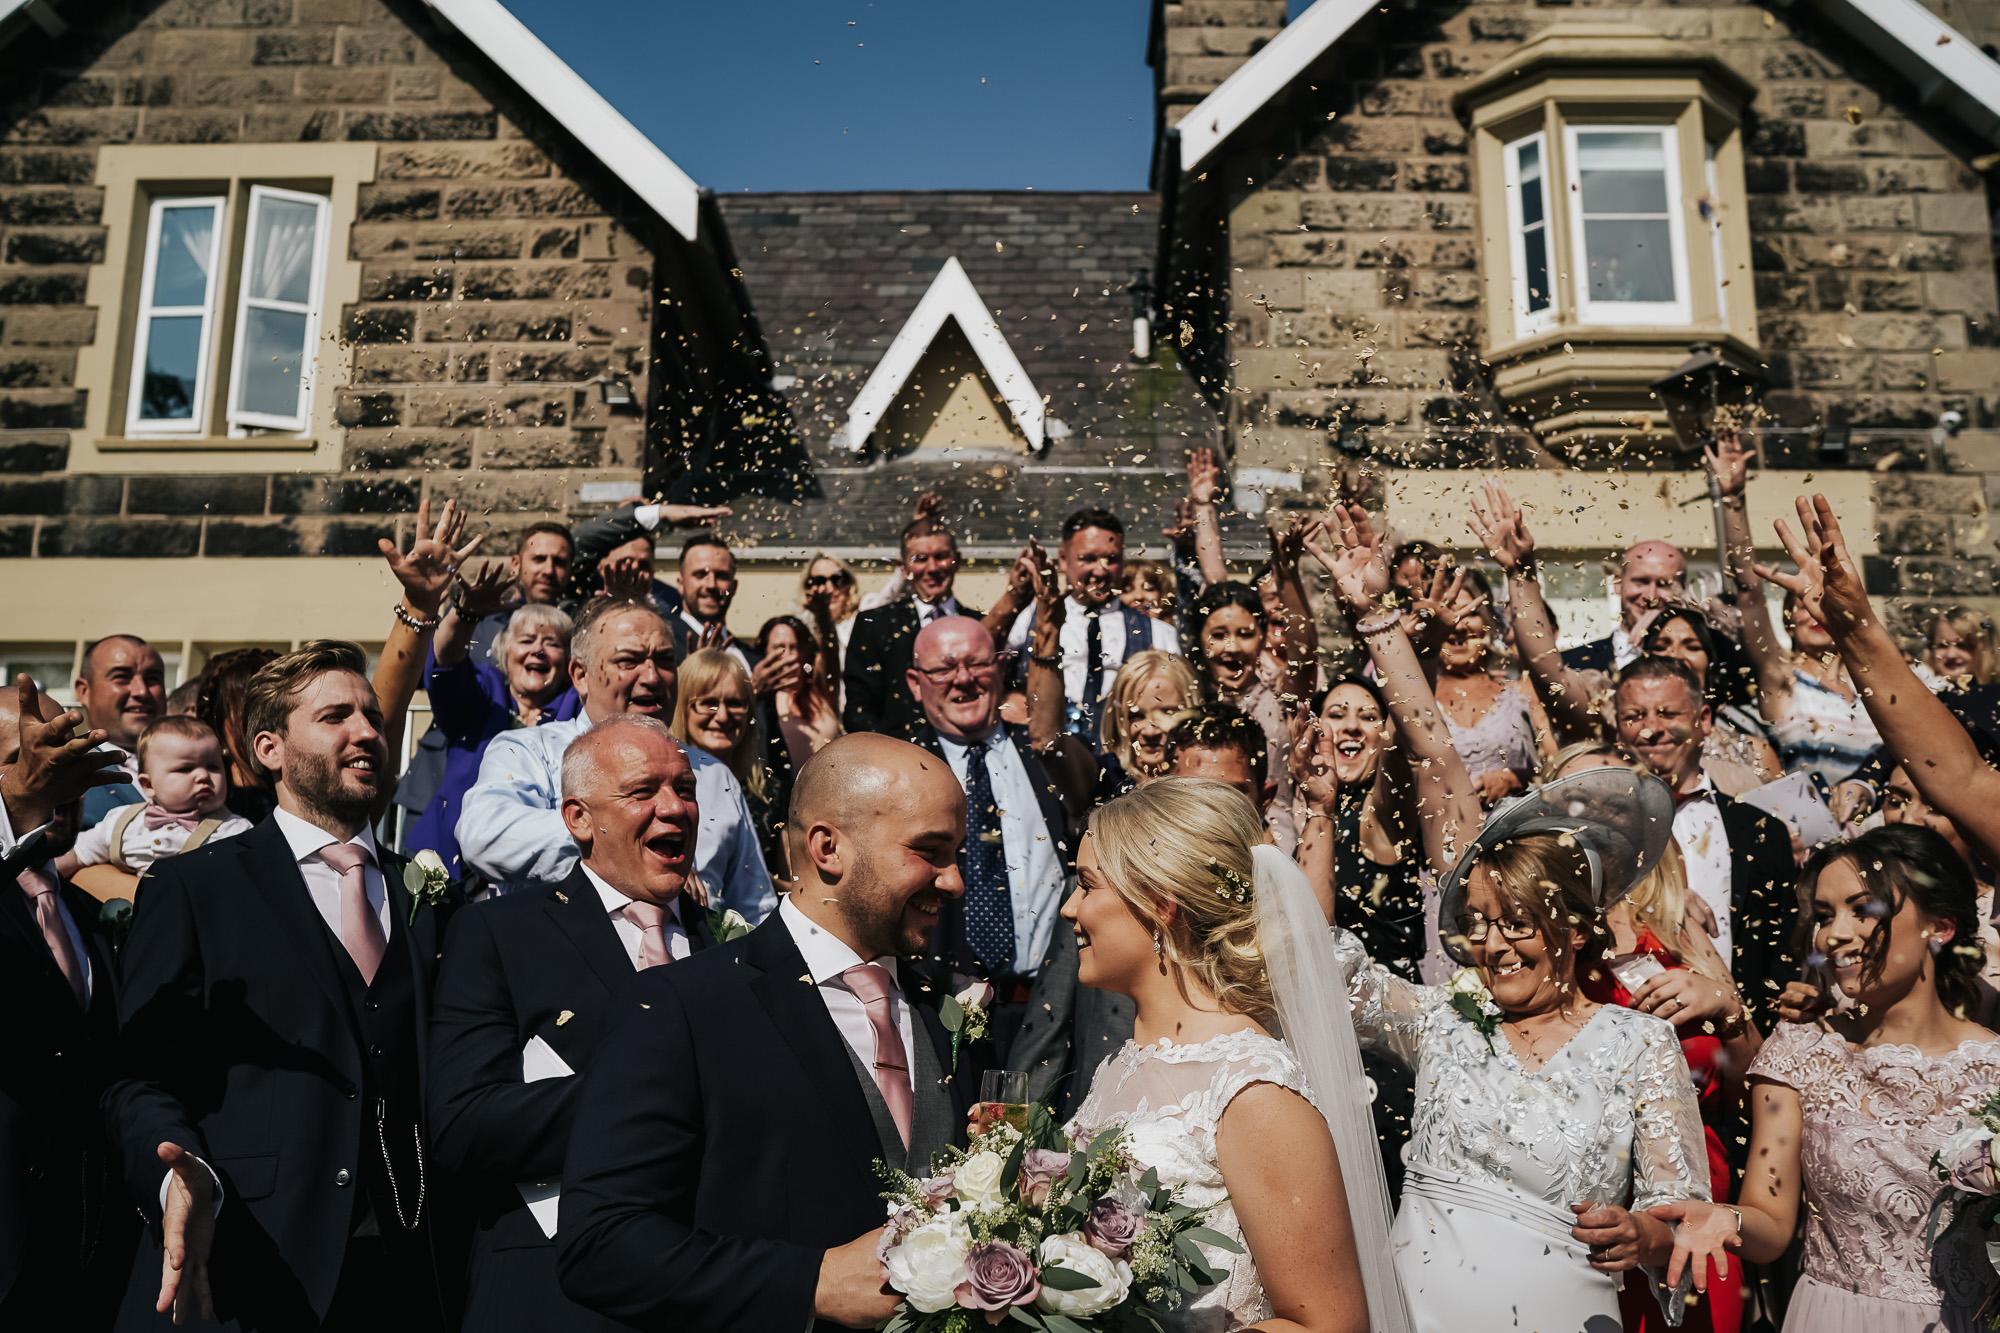 West Tower Wedding Photographer Ormskirk Lancashire wedding photography (27 of 57).jpg